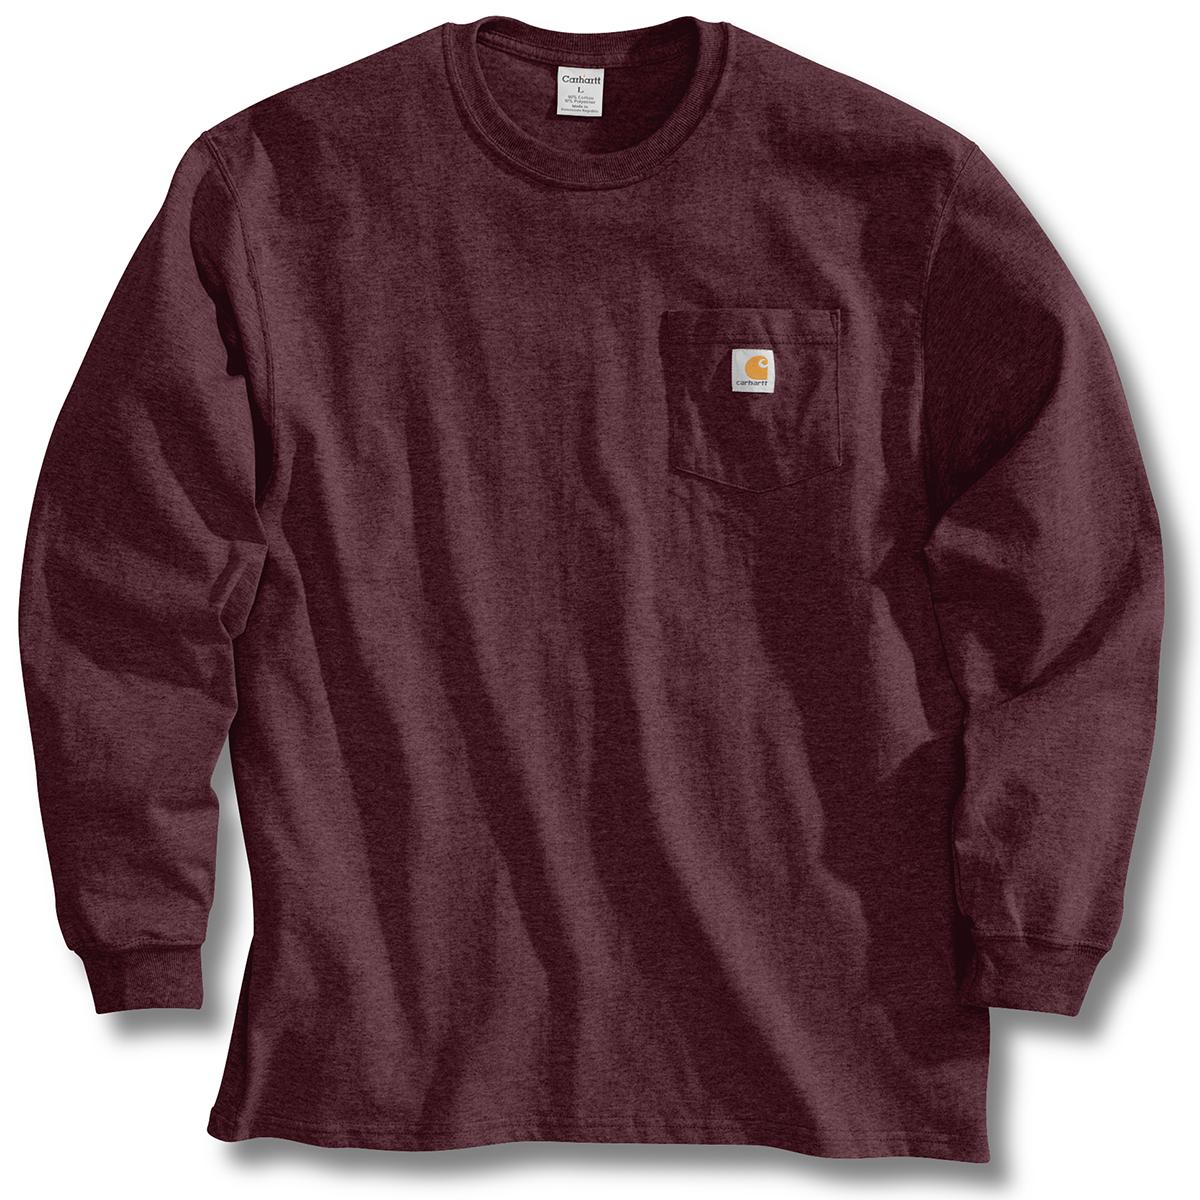 Carhartt Men's Workwear Pocket Long-Sleeve Tee - Red, S